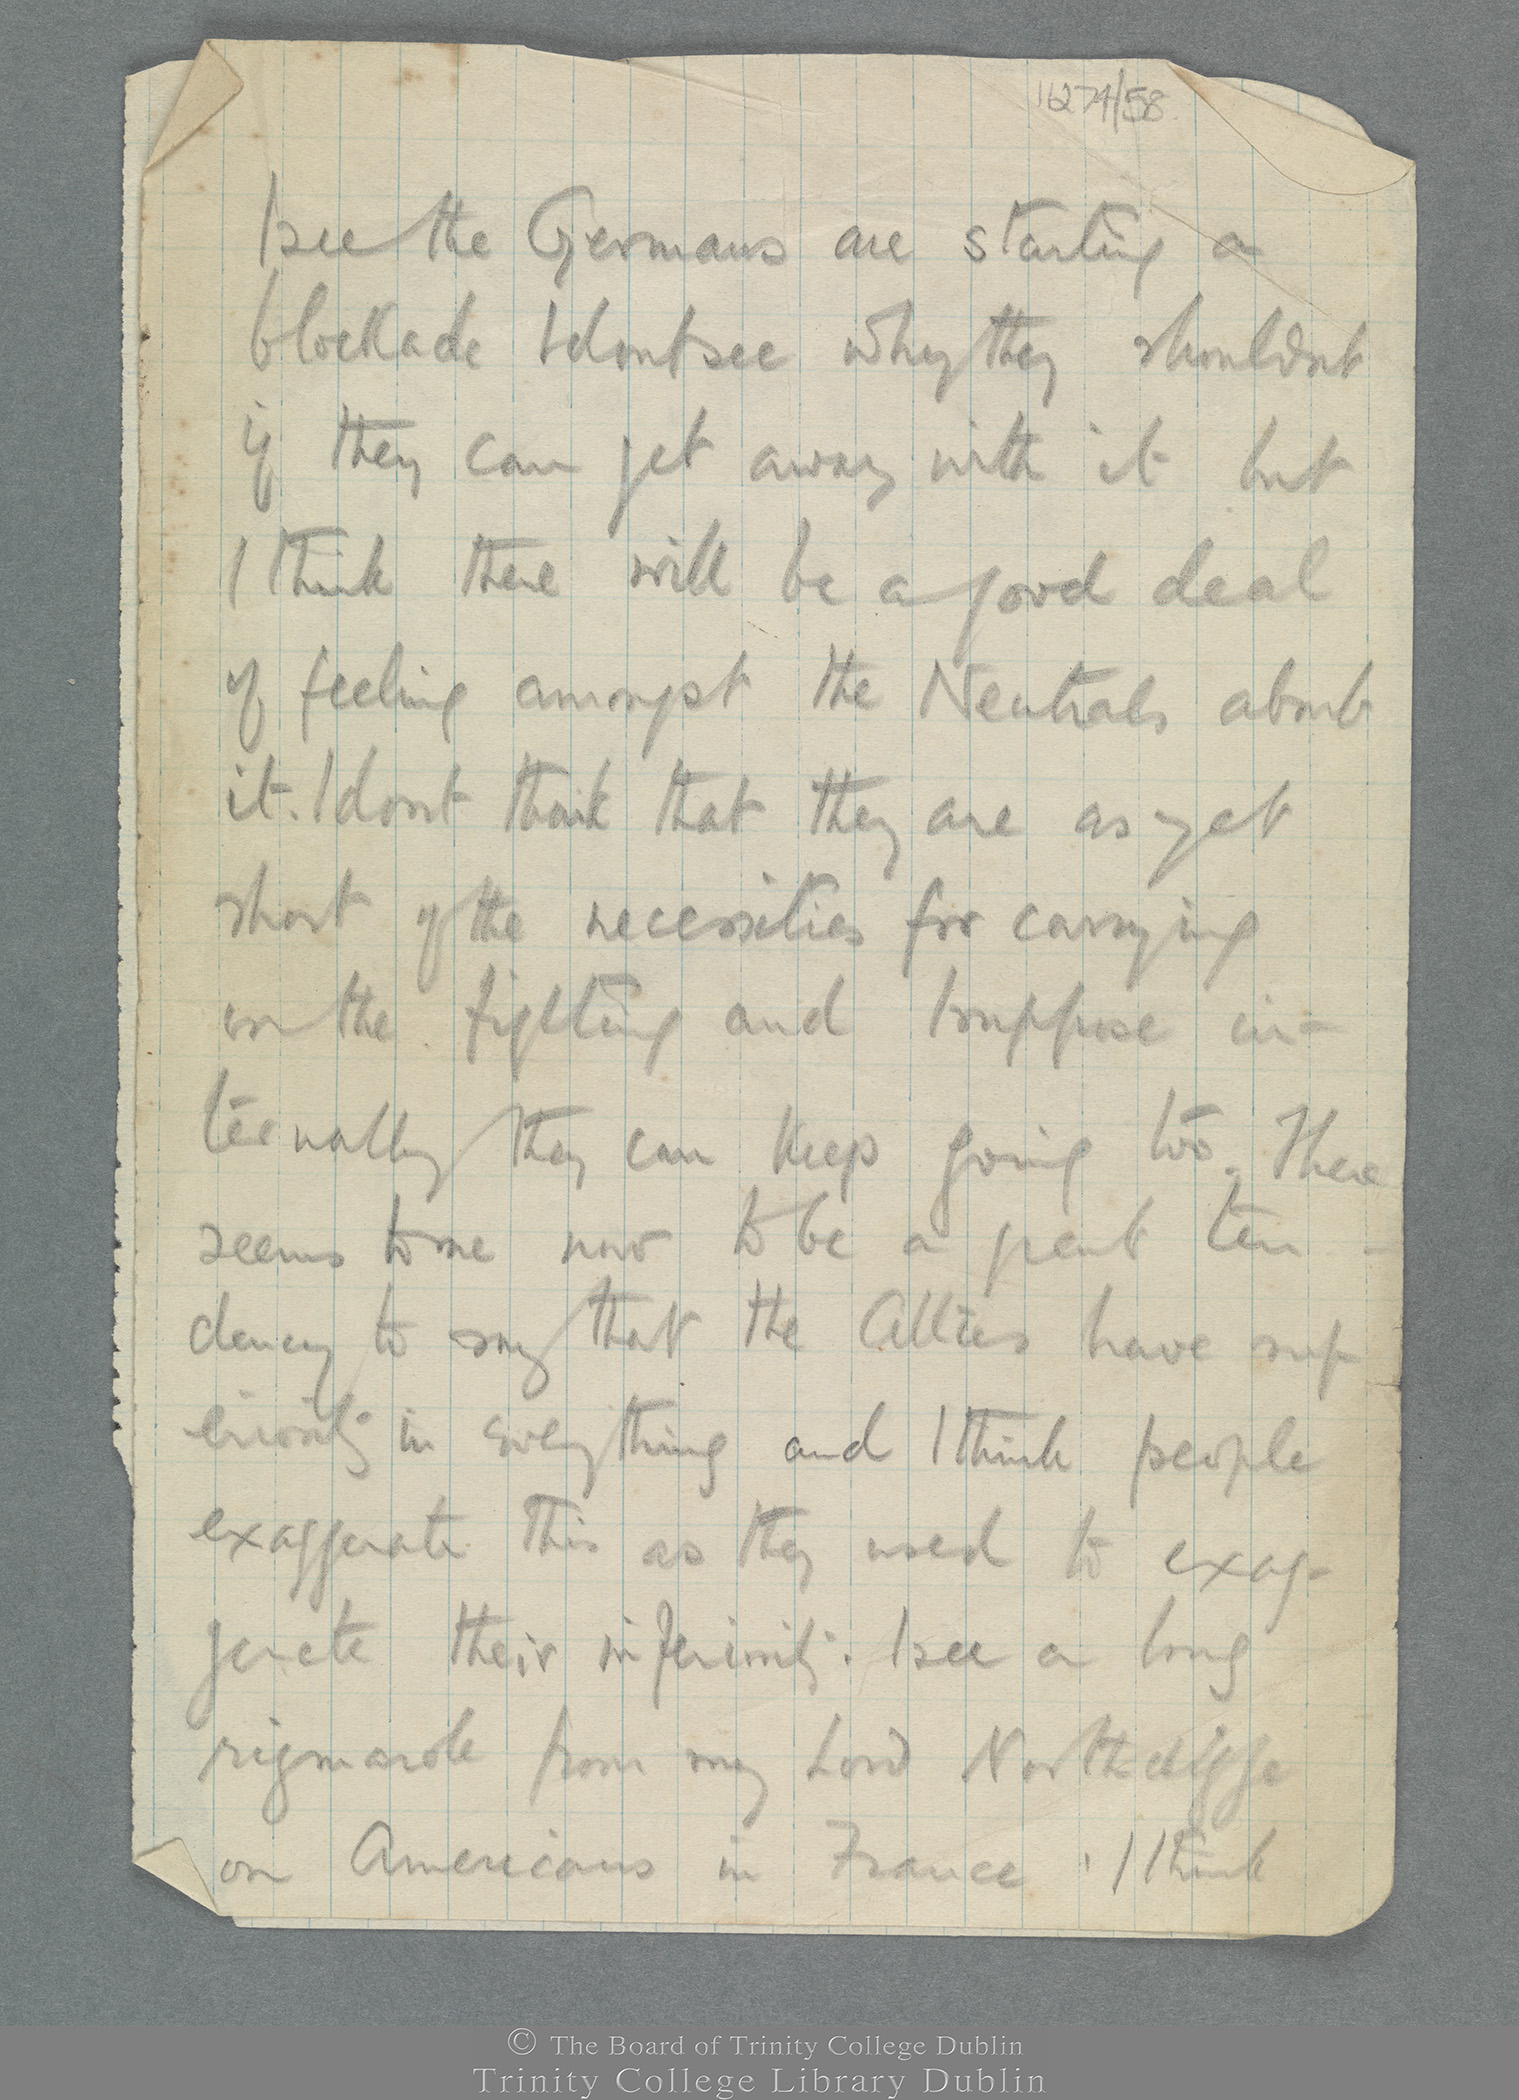 TCD MS 11274/58 folio 10 recto